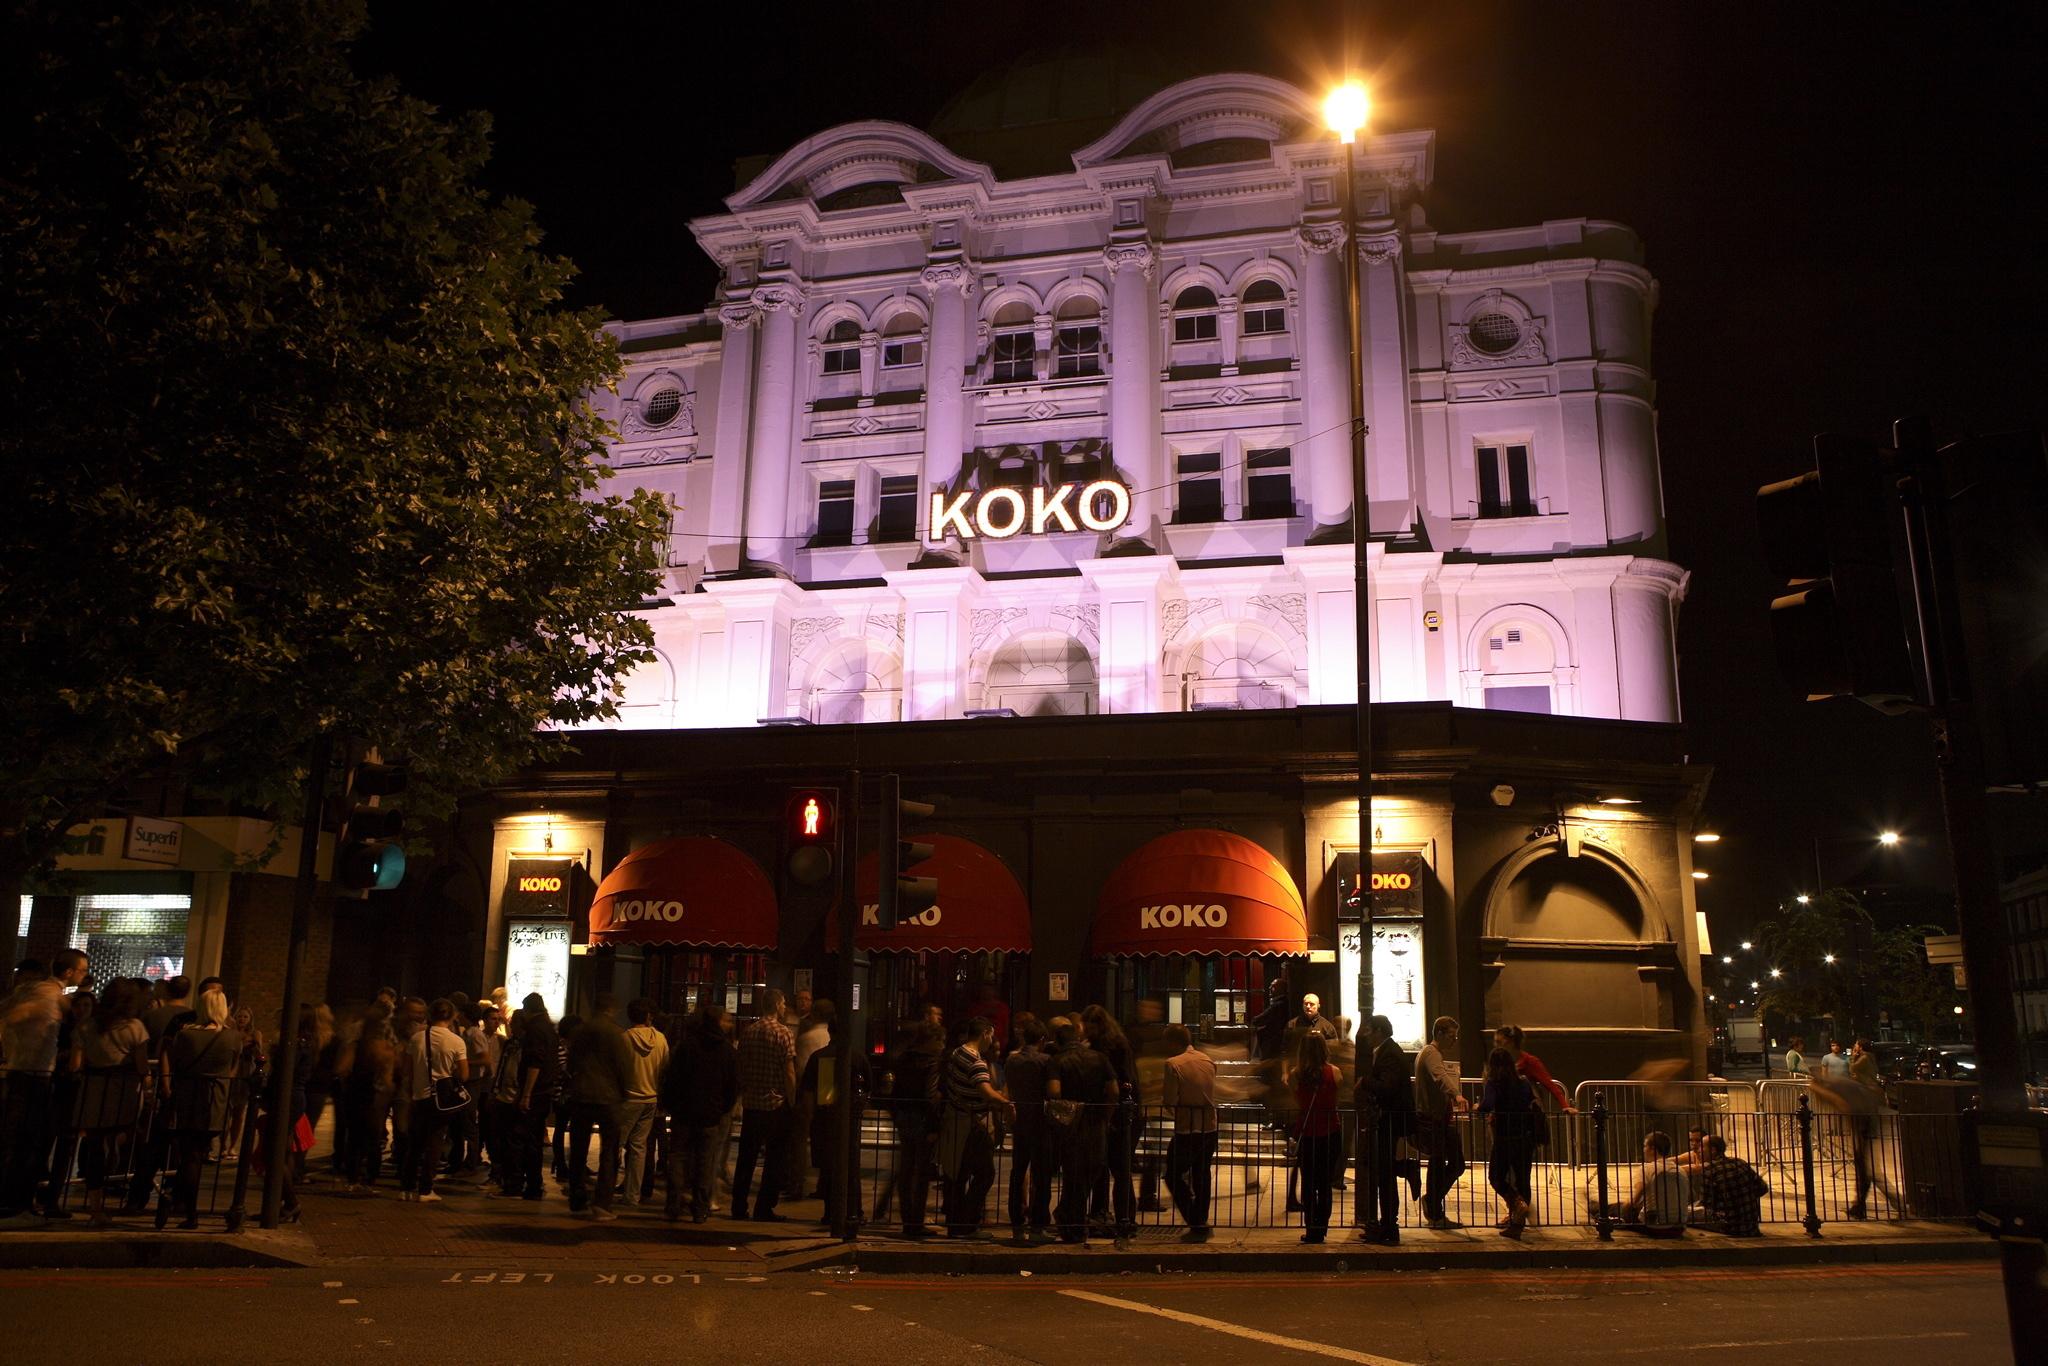 The Koko